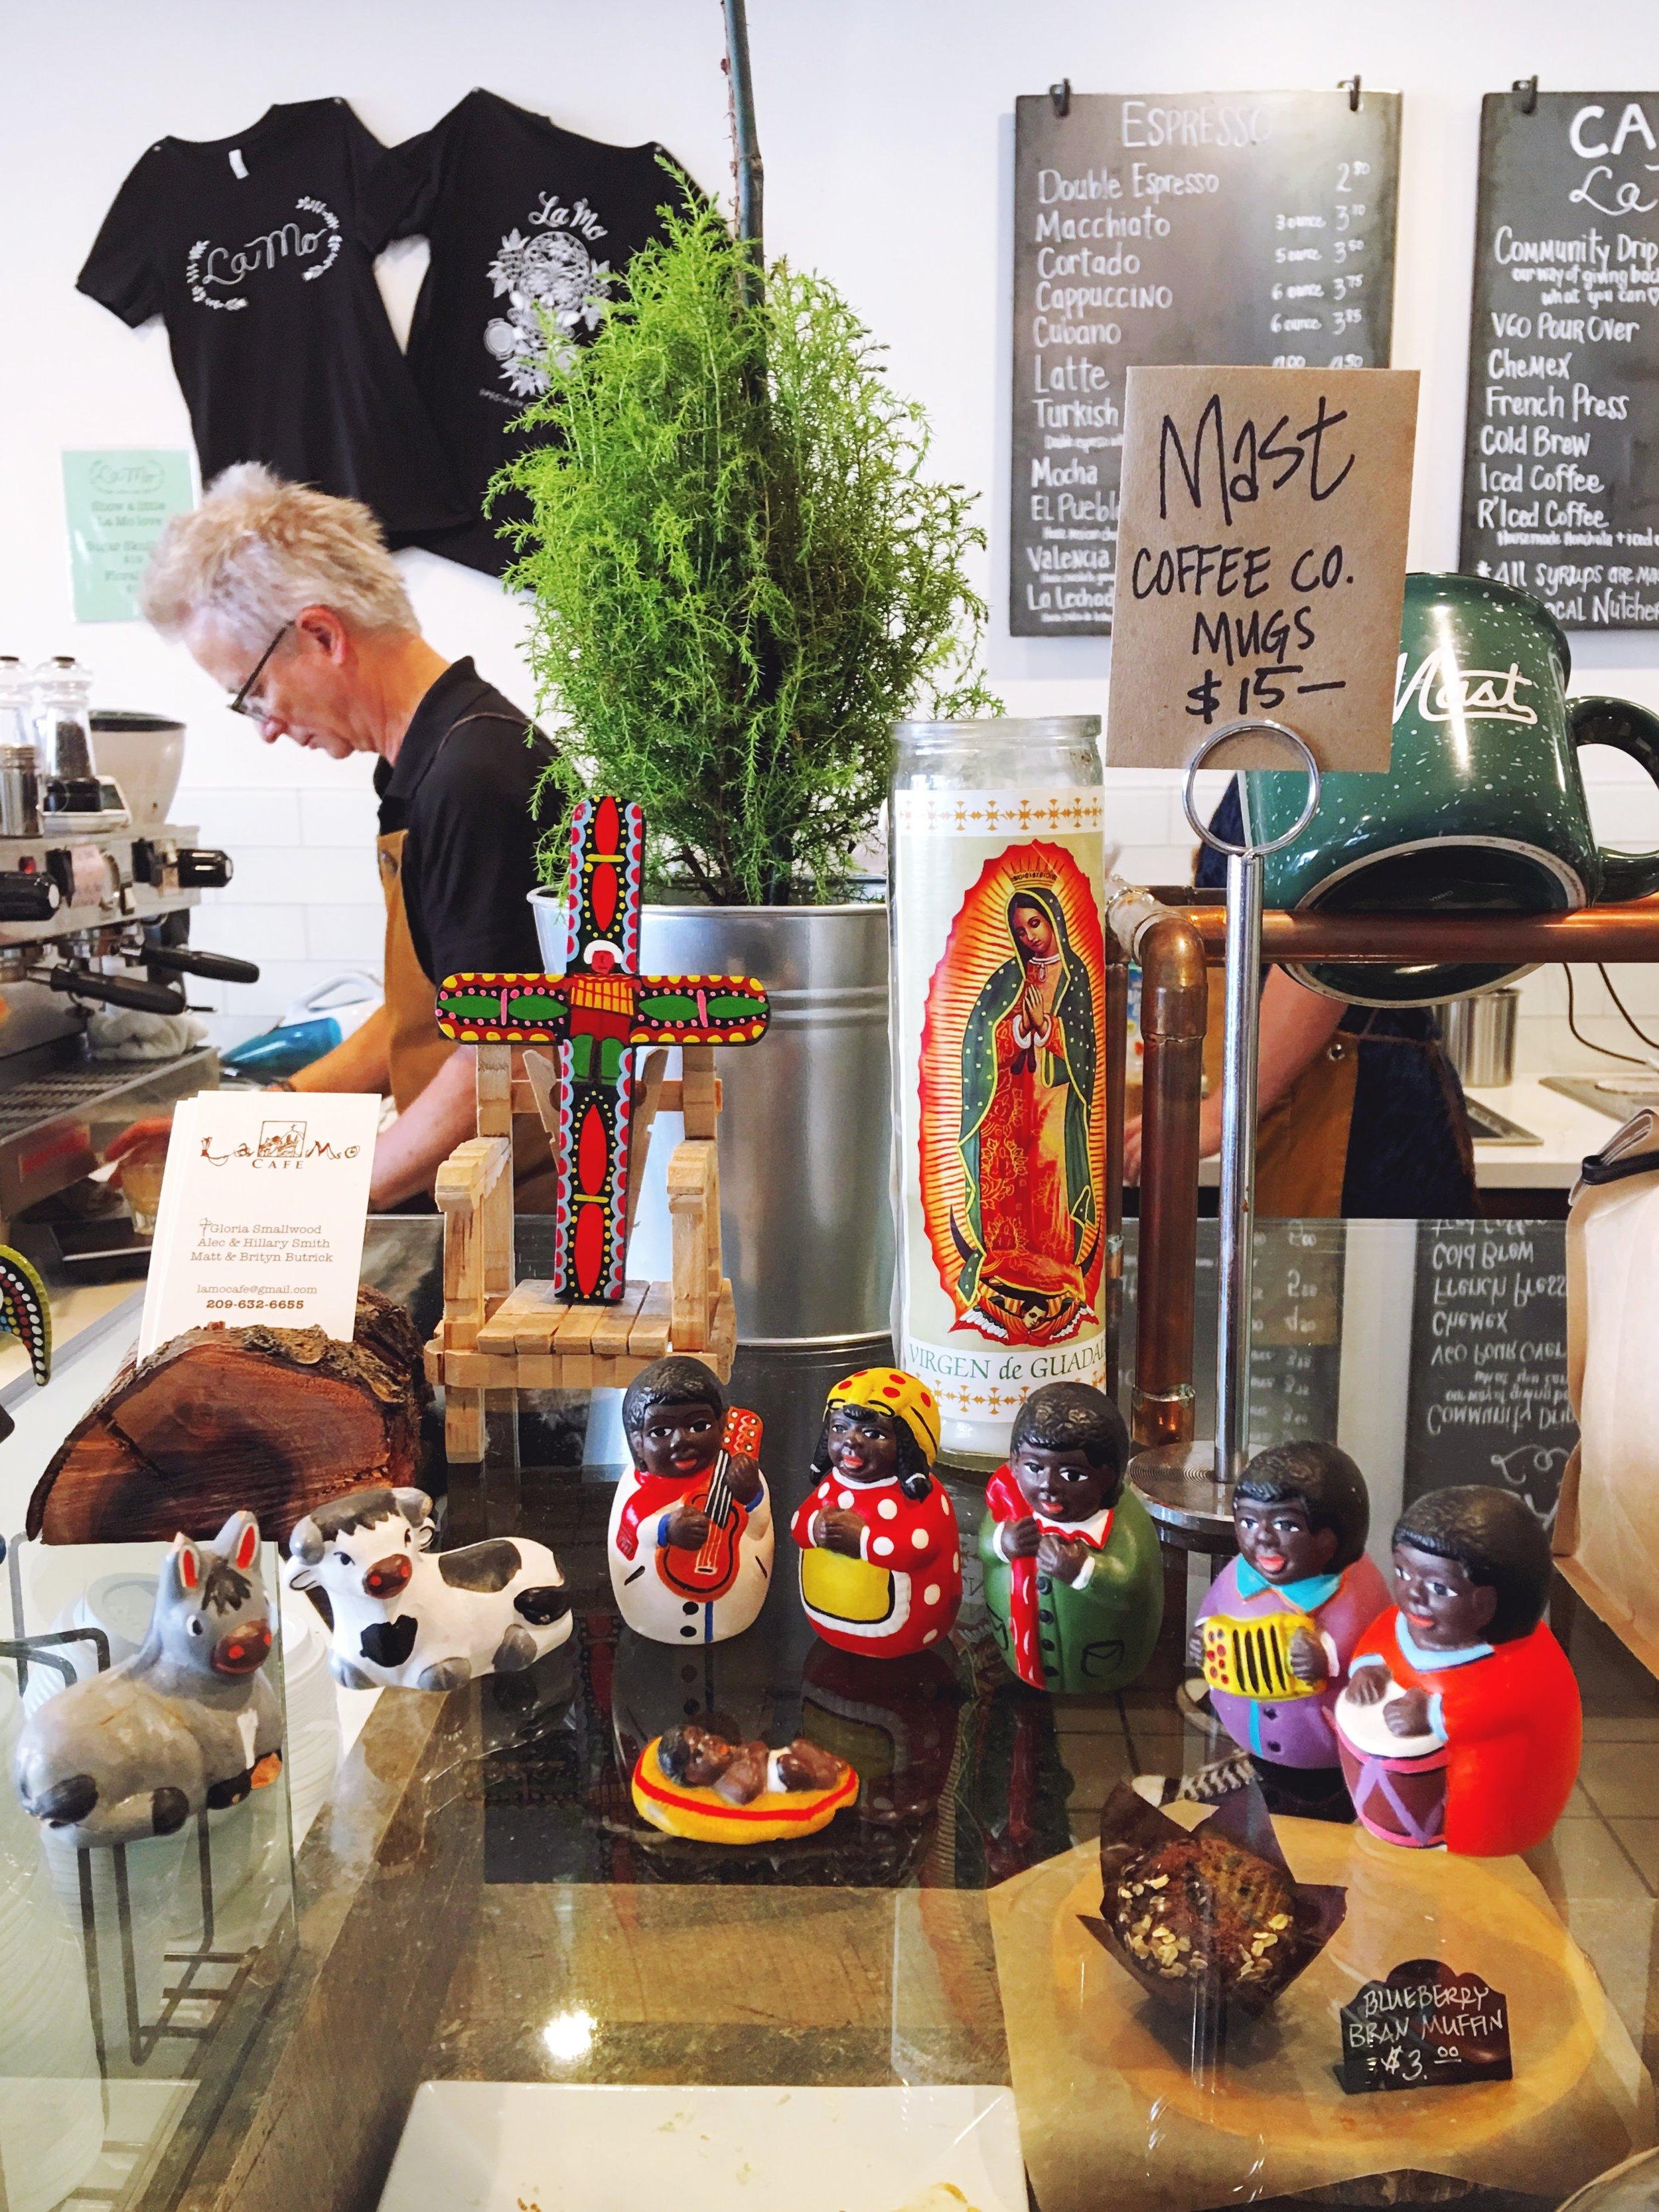 Hispanic Inspired Deco at La Mo Cafe